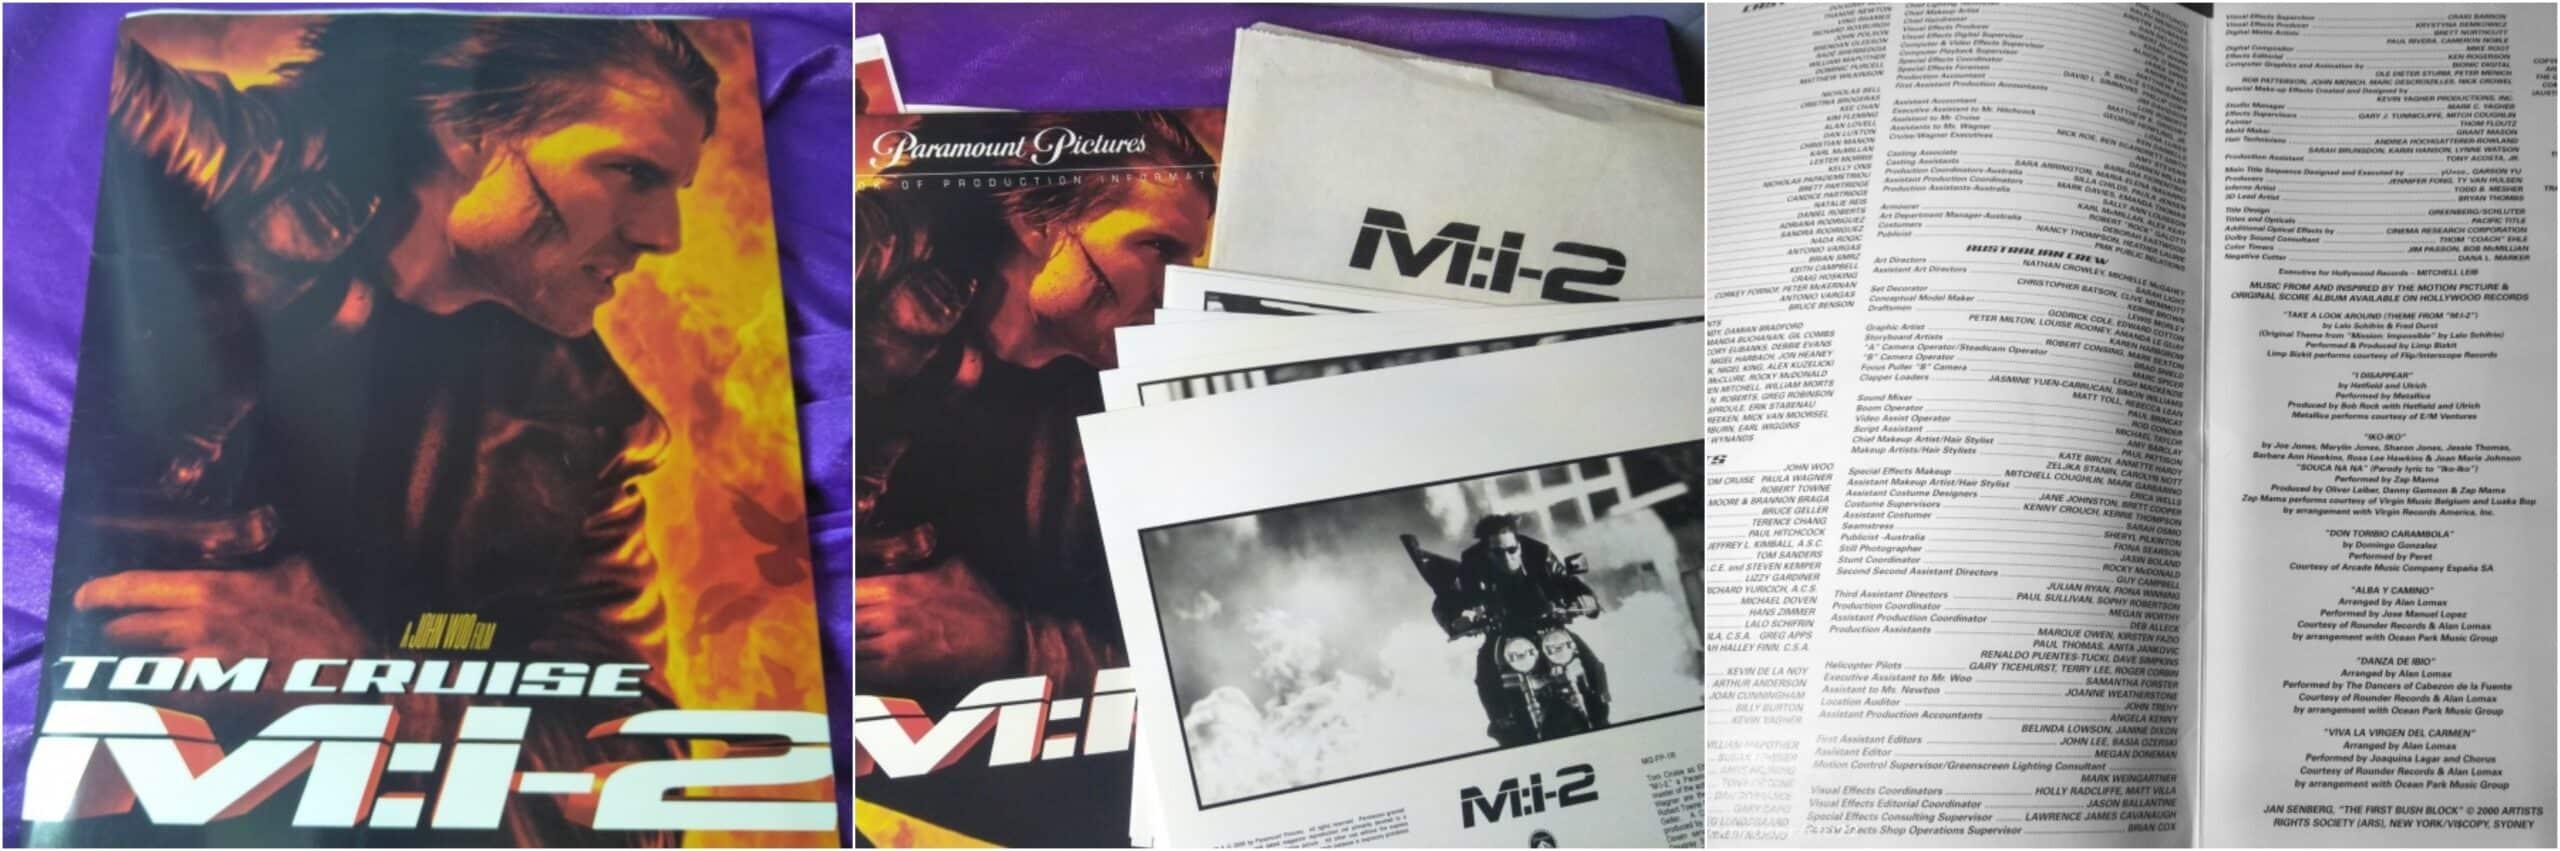 M:i-2 Press Kit Mission:Impossible-2